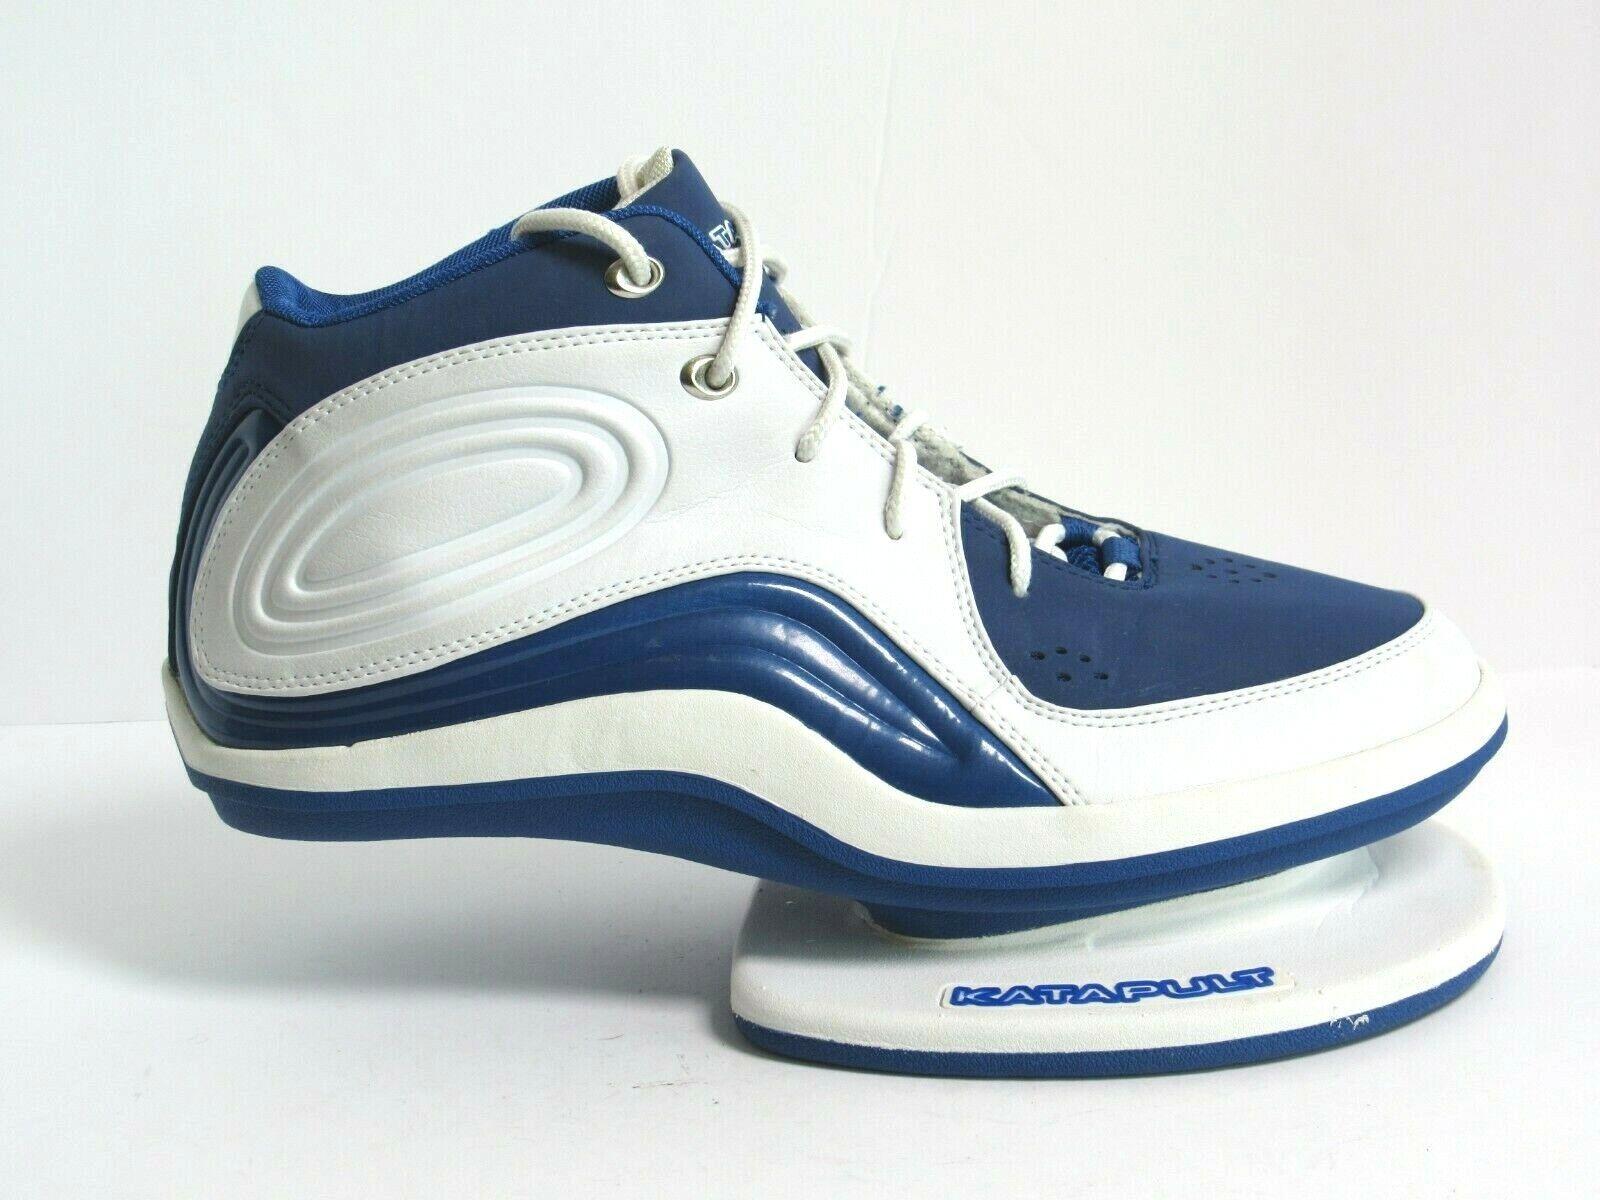 Katapult Men's Athletic Training Innovation shoes Size 11.5 bluee White (CB5)